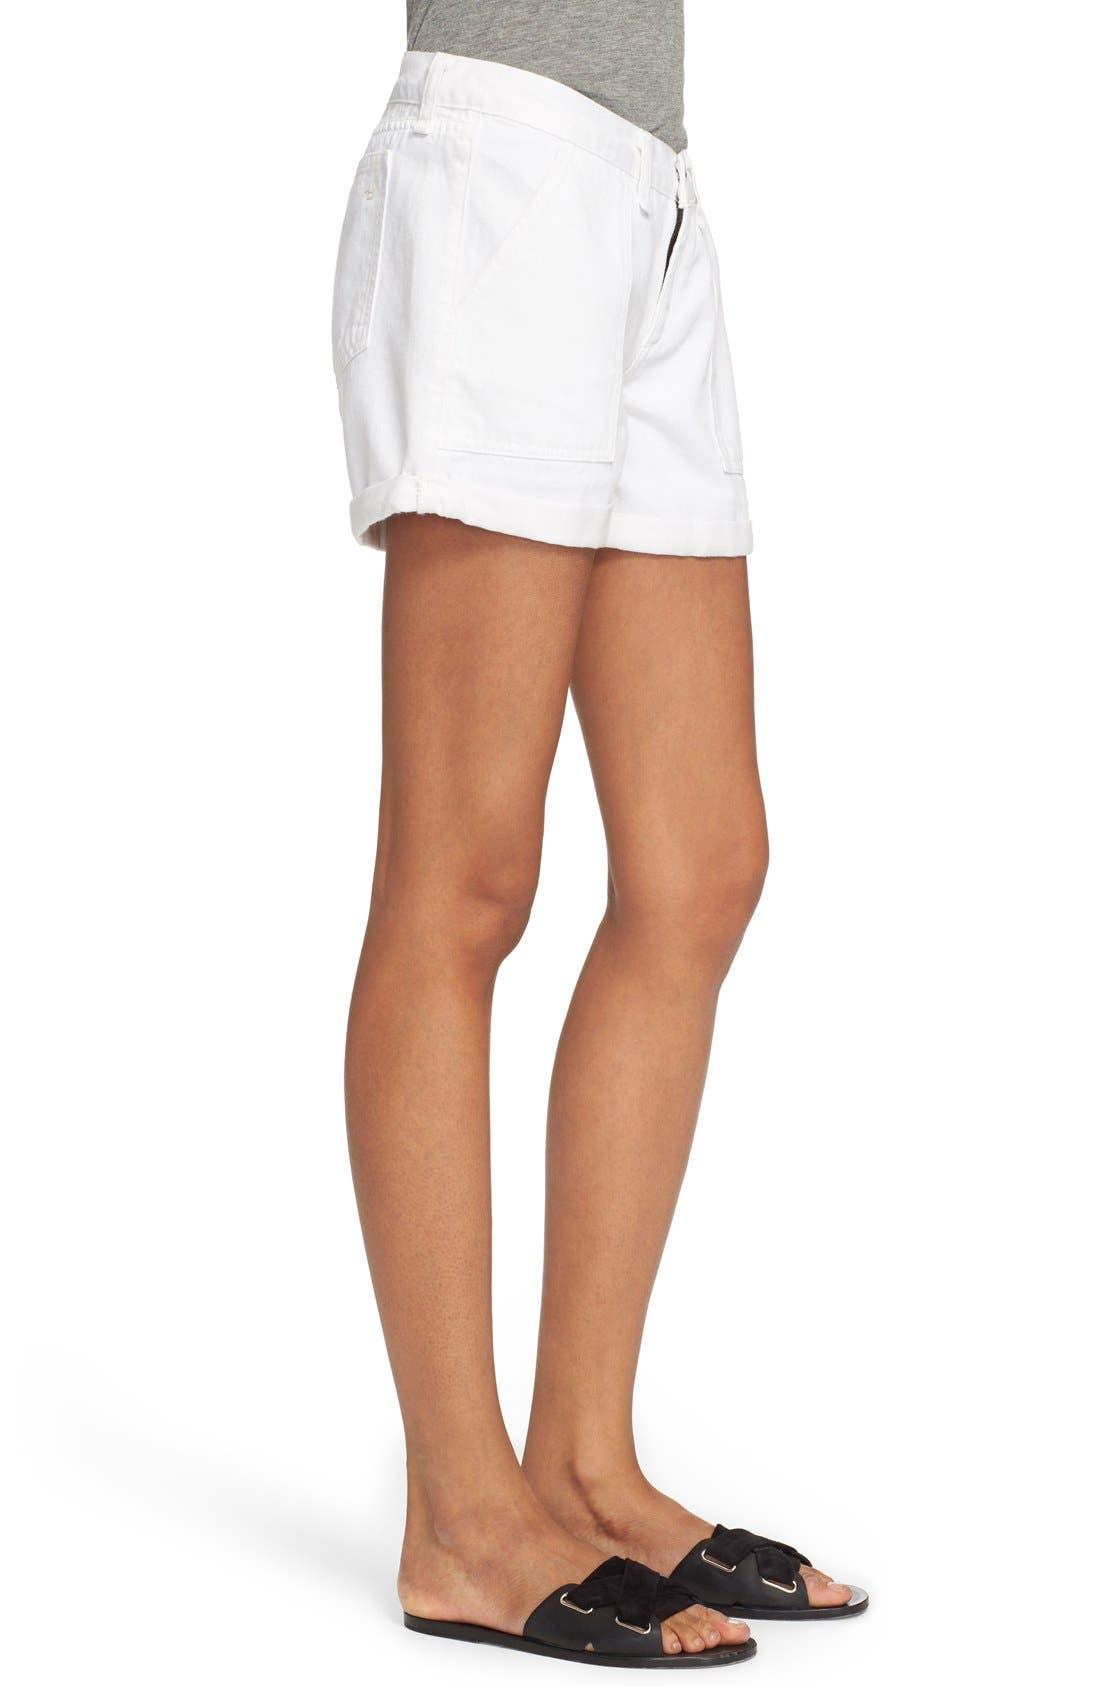 Alternate Image 3  - rag & bone/JEAN 'Carpenter' Cuffed Denim Shorts (Aged Bright White)